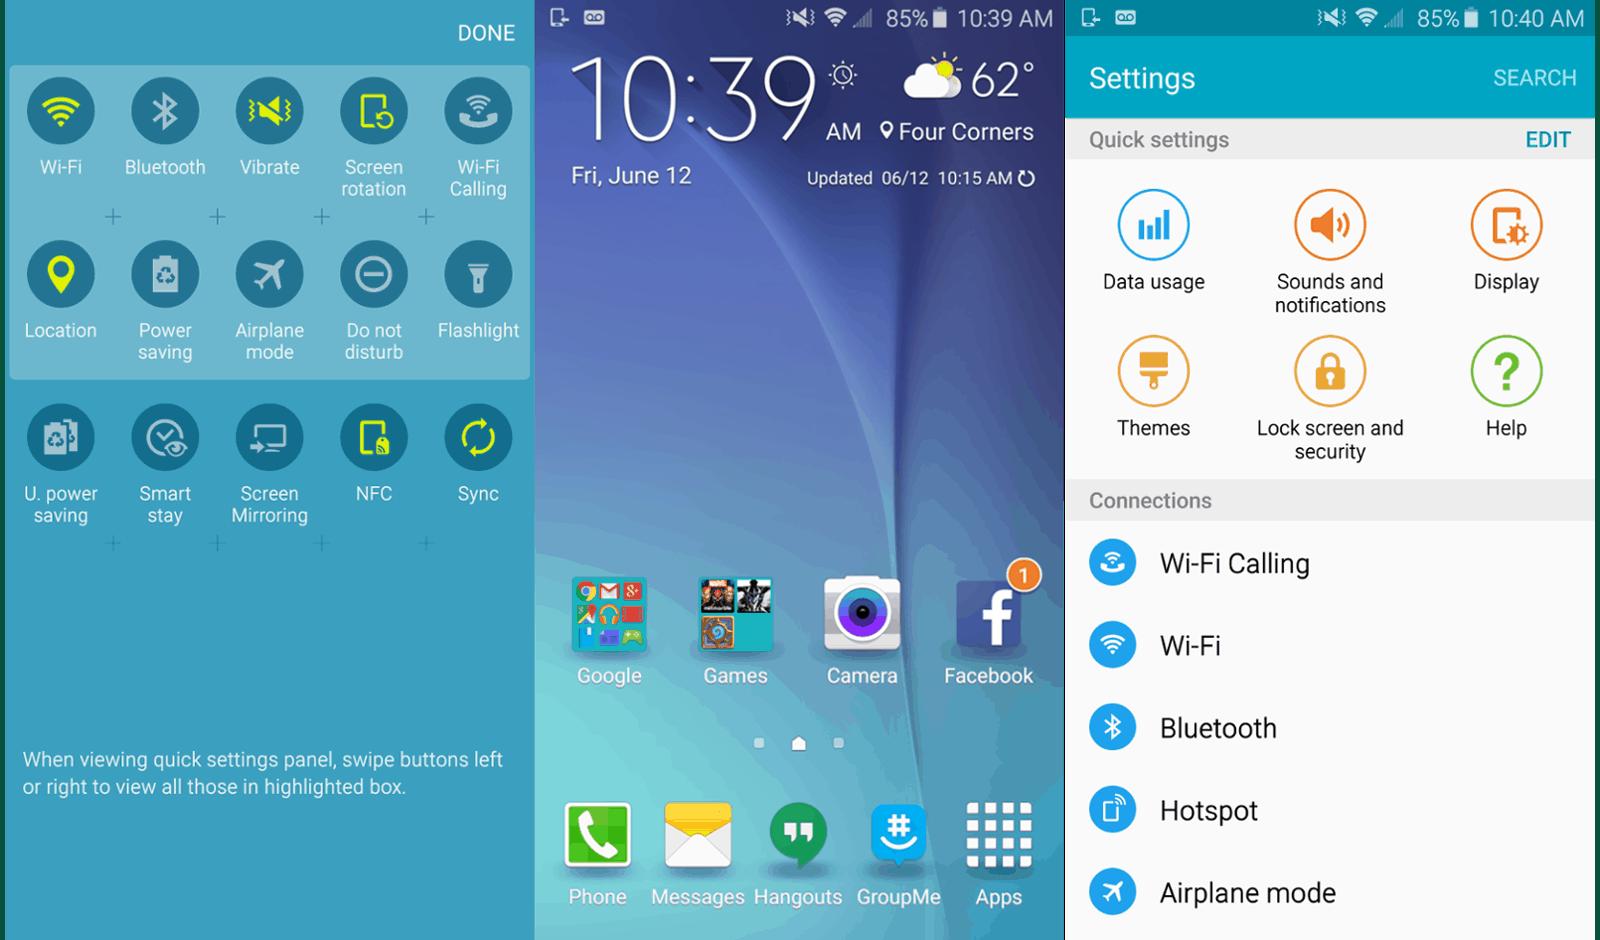 Samsung Galaxy S6 Software